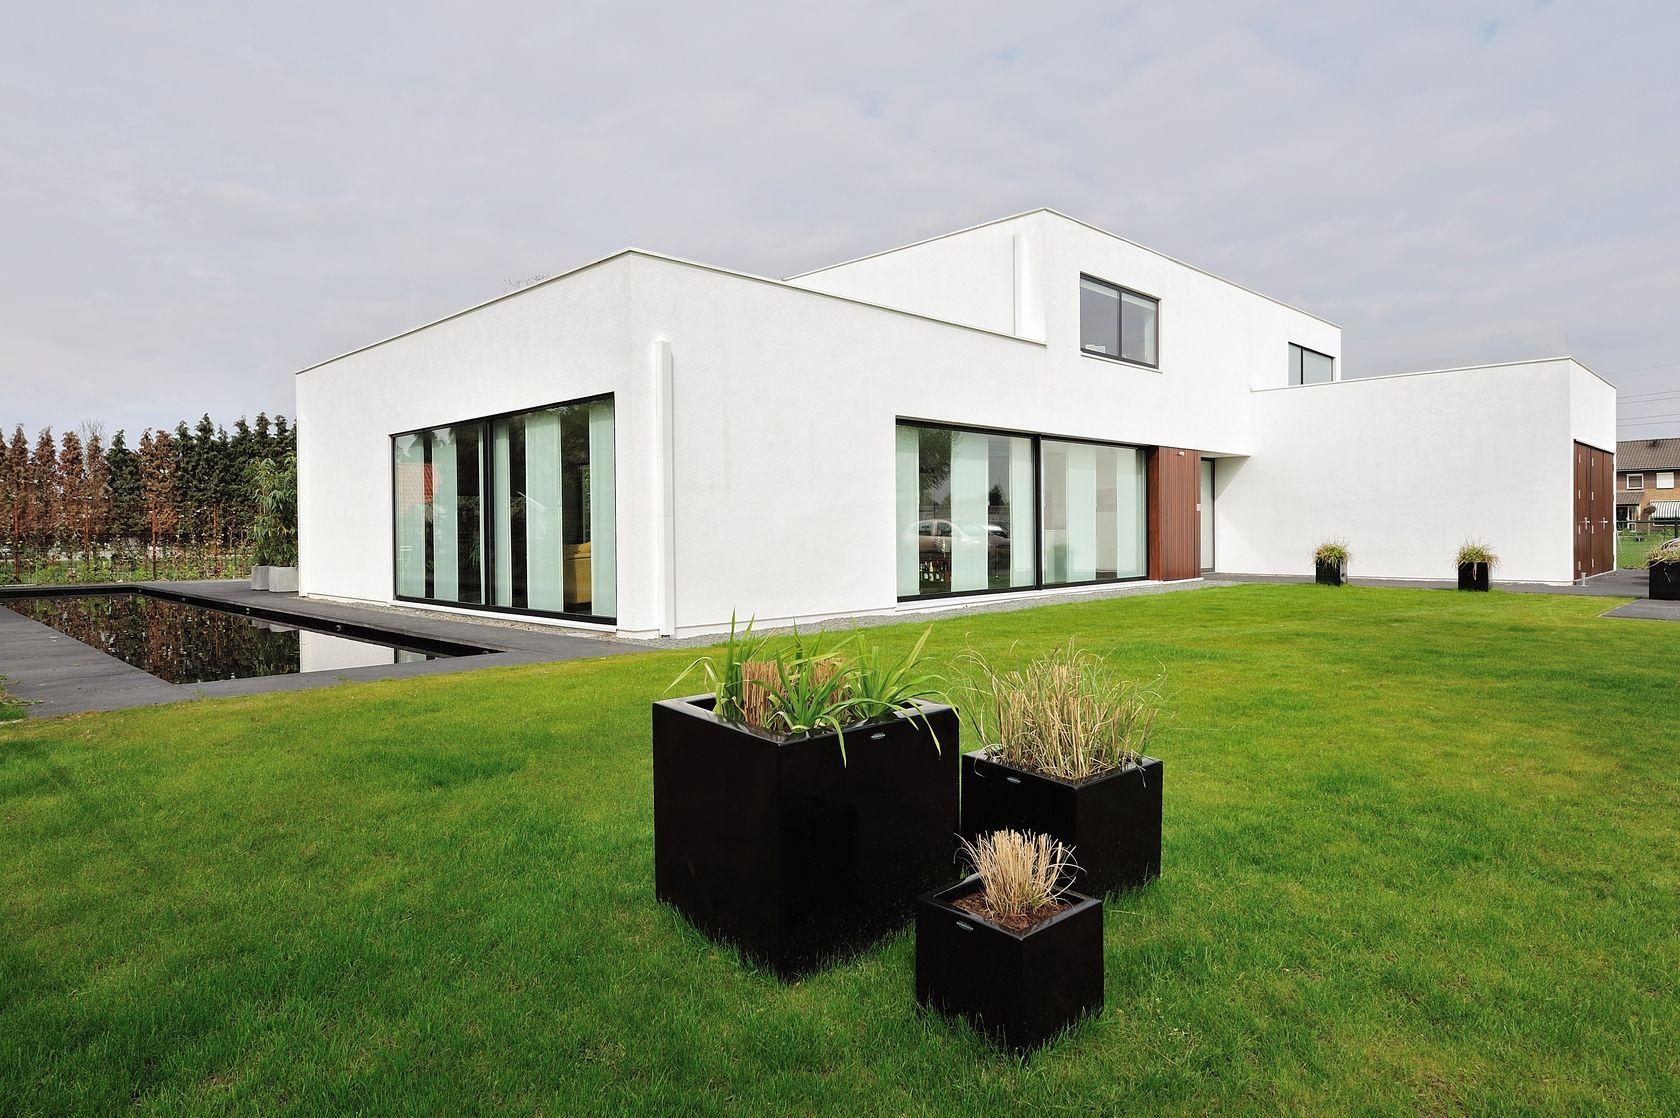 Casa en Bemmel (Países Bajos) | Maxim Winkelaar